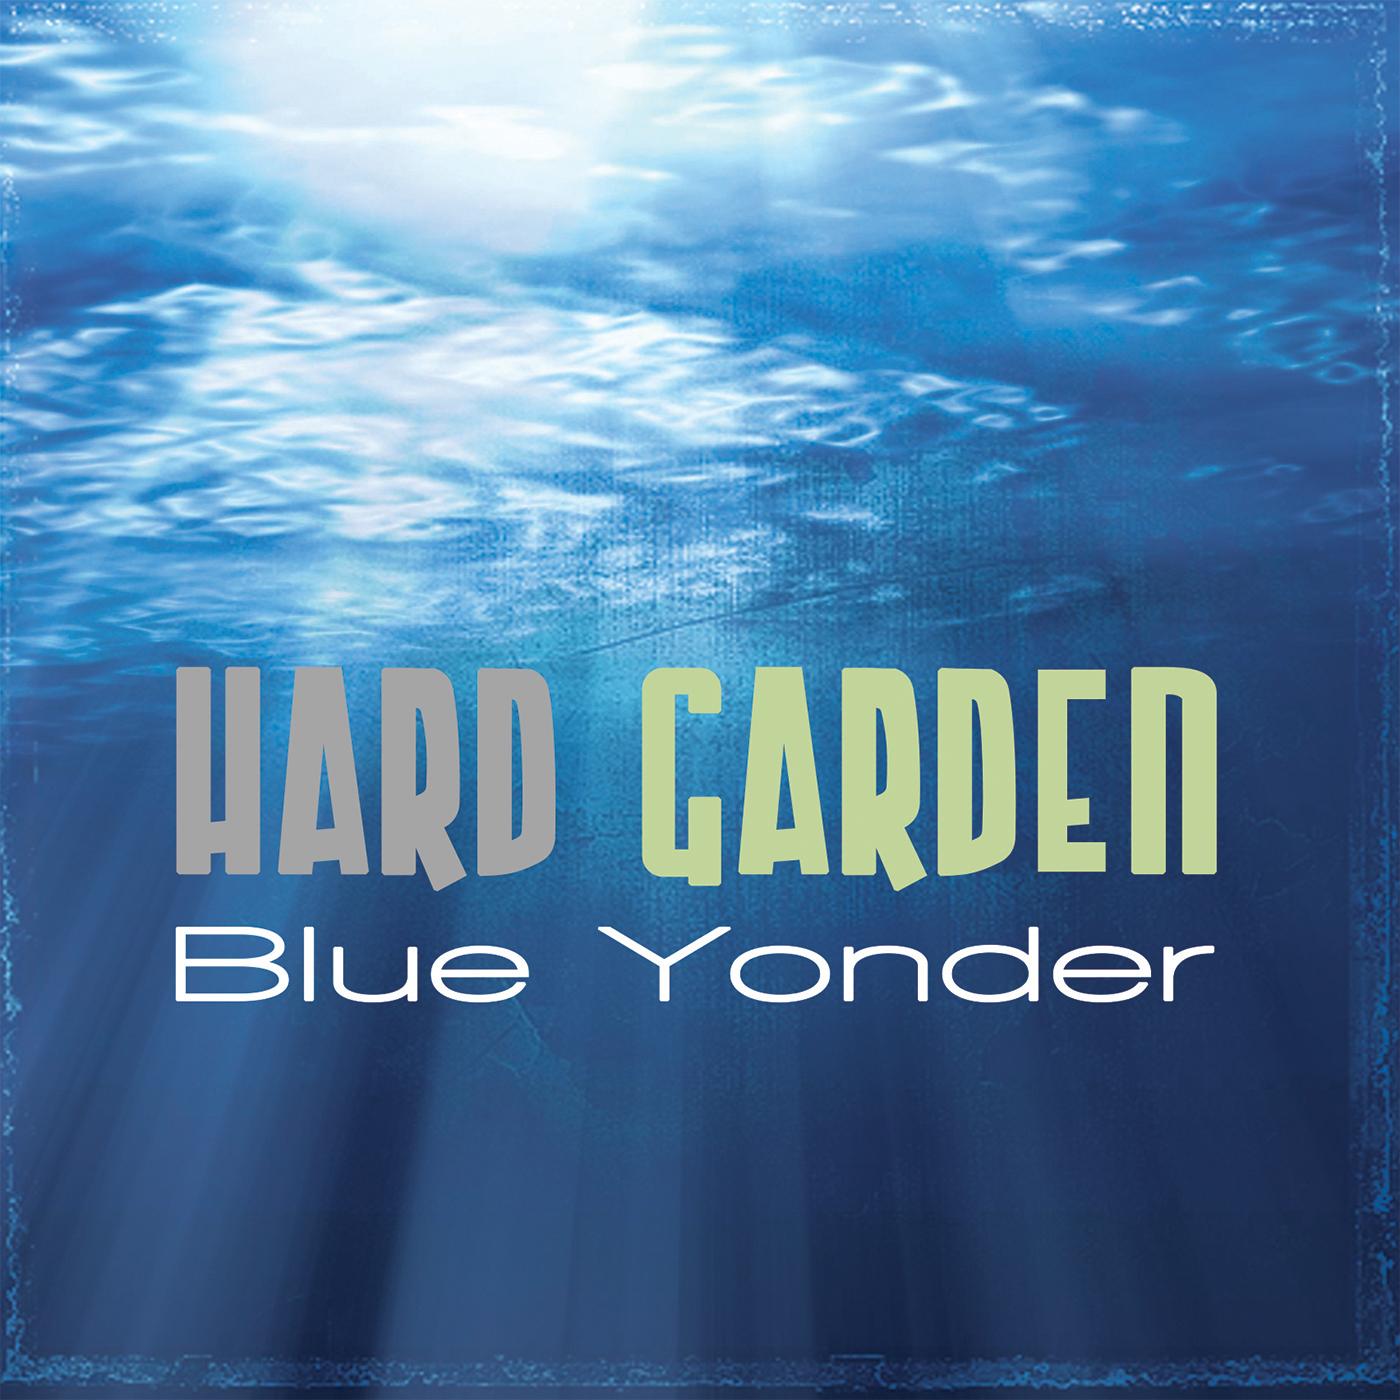 Blue Yonder CD Cover